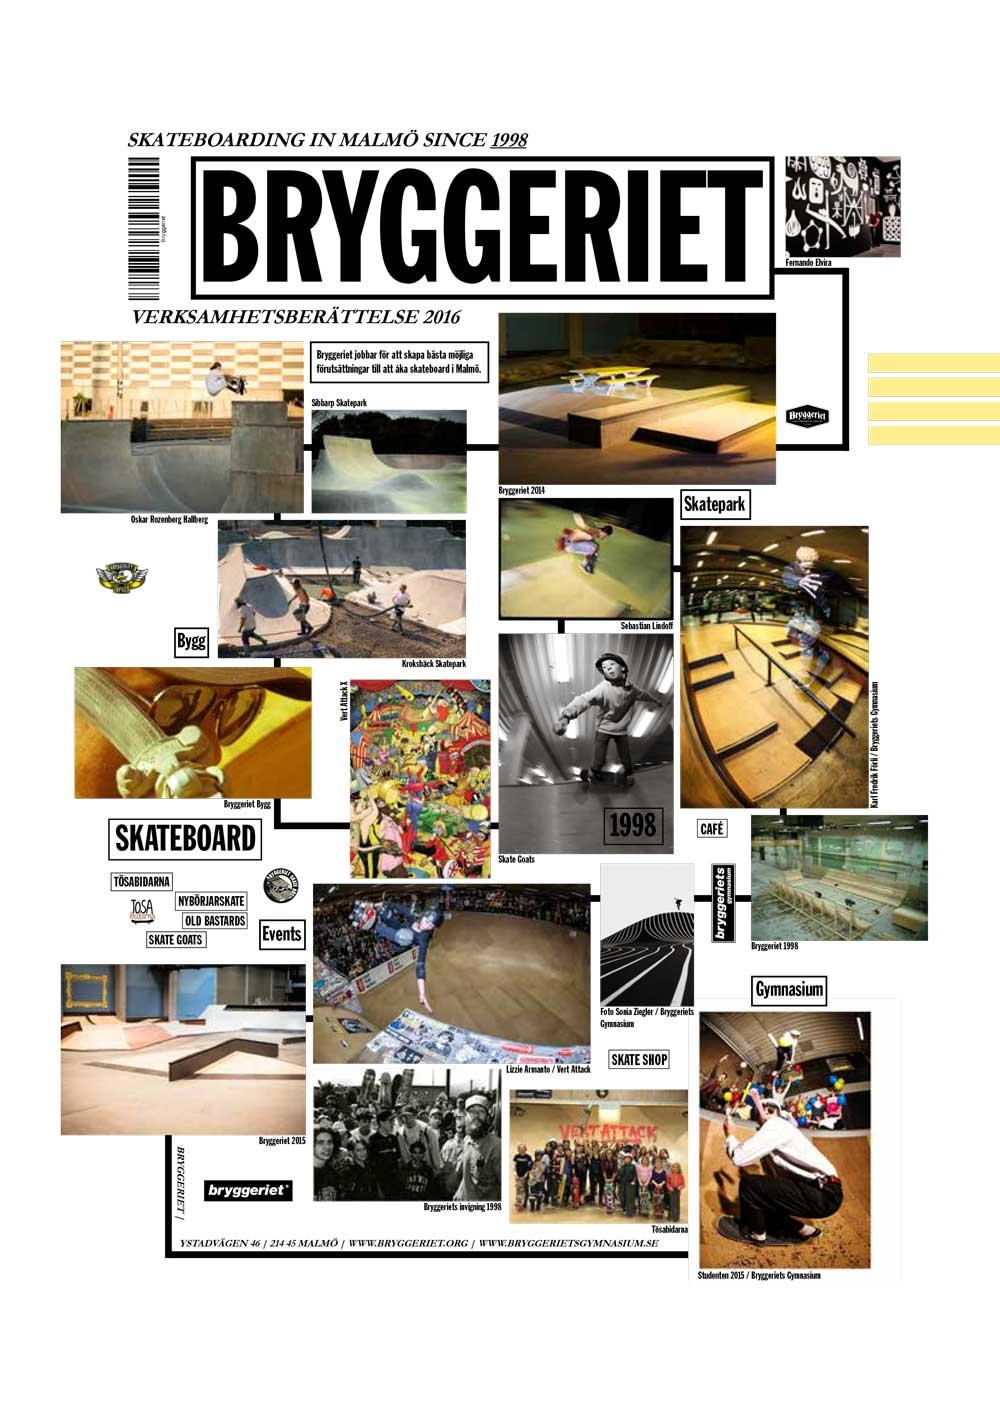 bryggeriet-verksamhetsberättelse-2016-1